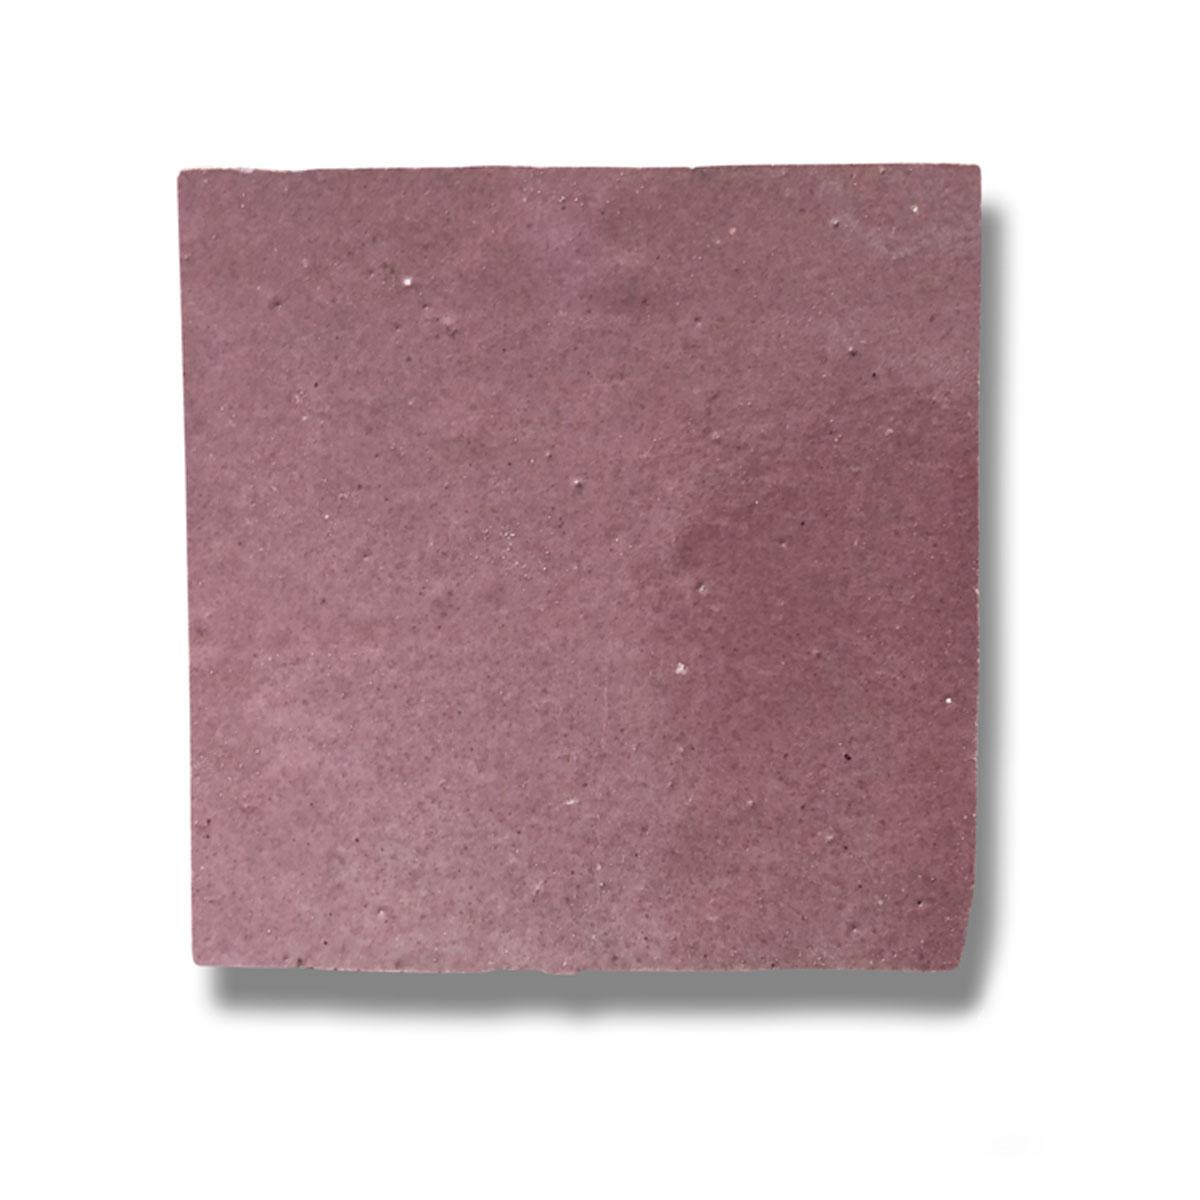 Clay Zellige - Cerise - Moroccan feature tiles - Stone3 Brisbane